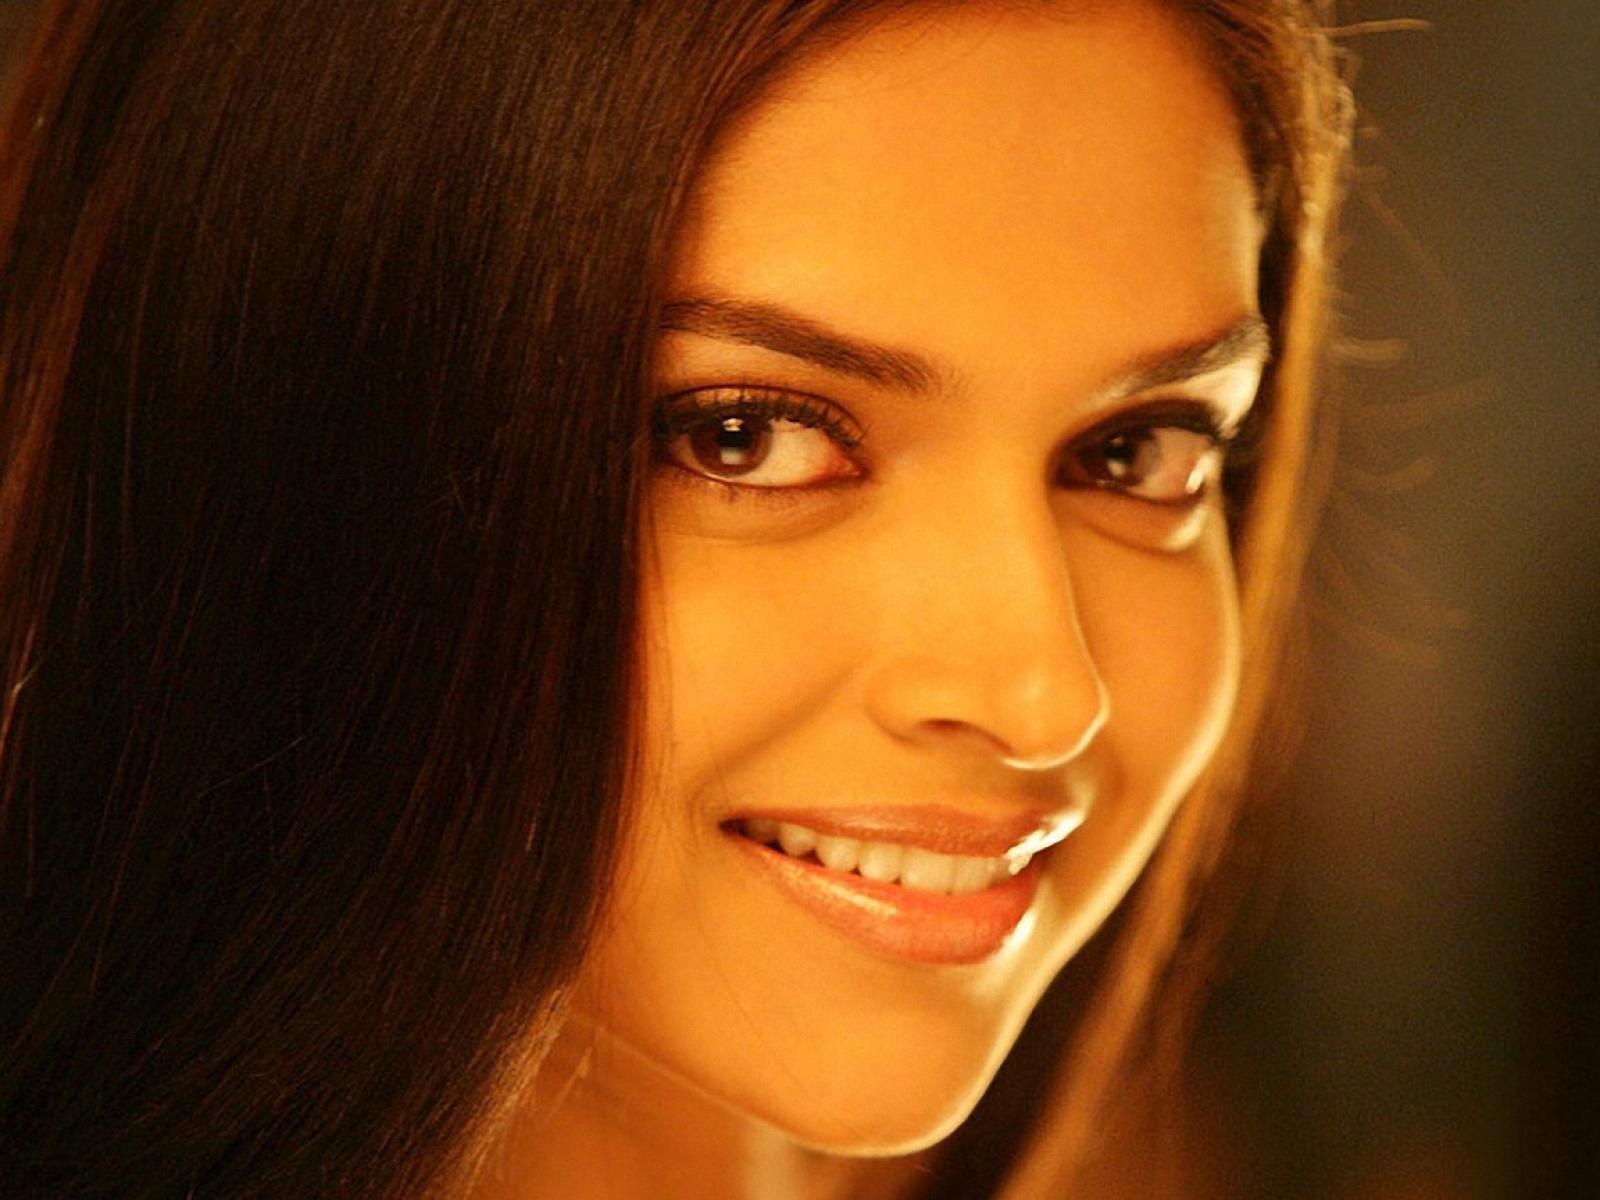 Hot pictures Deepika Padukone